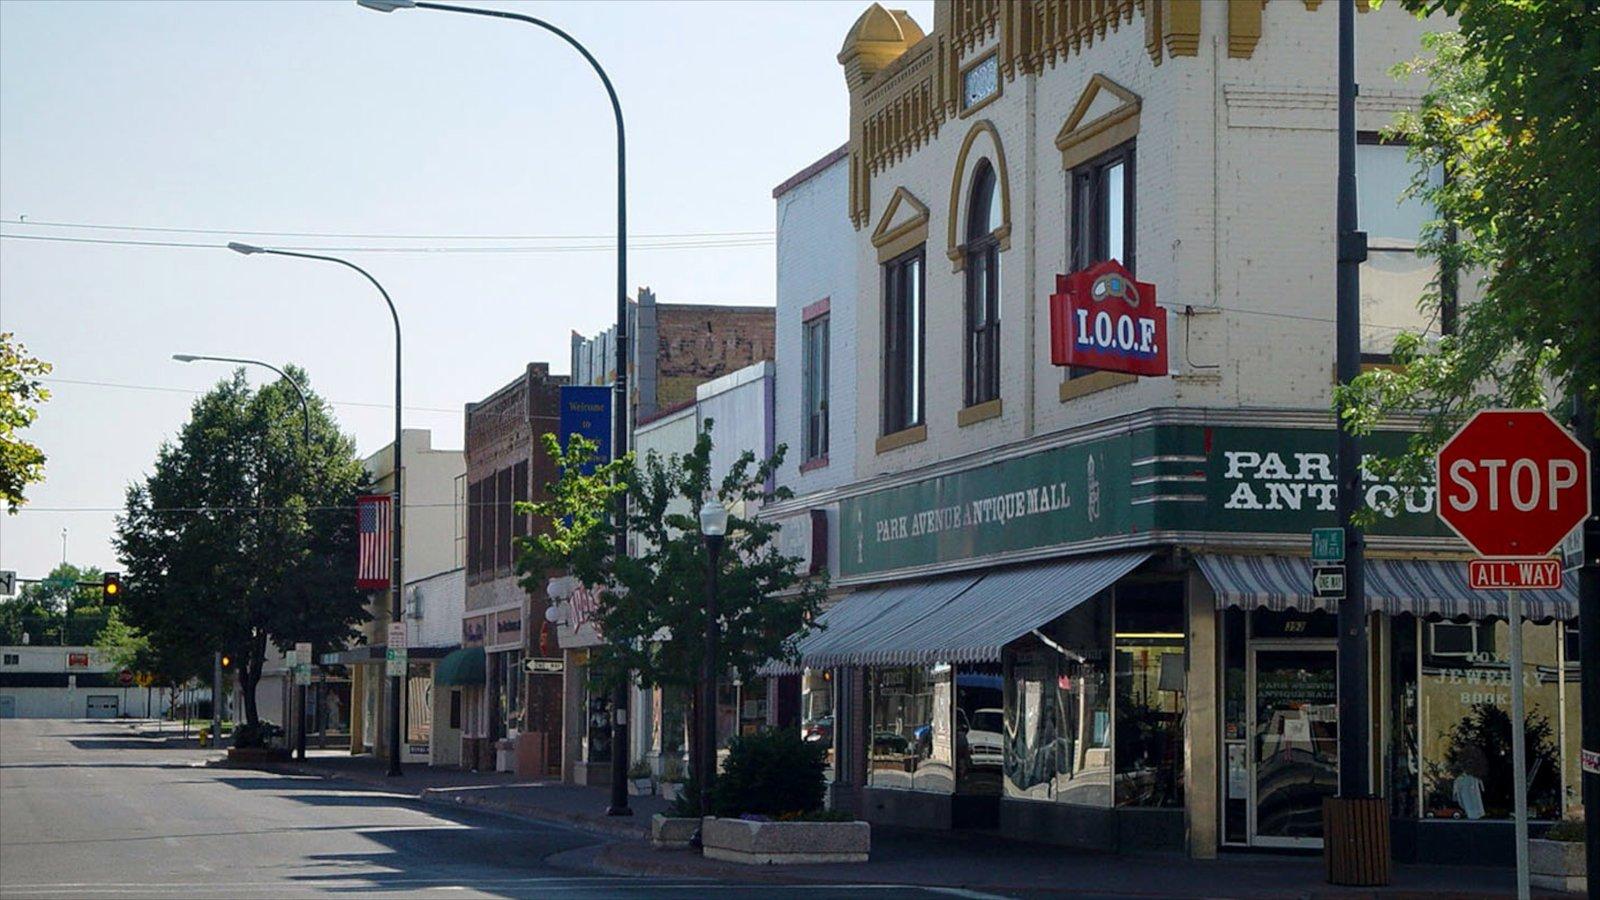 Idaho Falls showing a city and signage